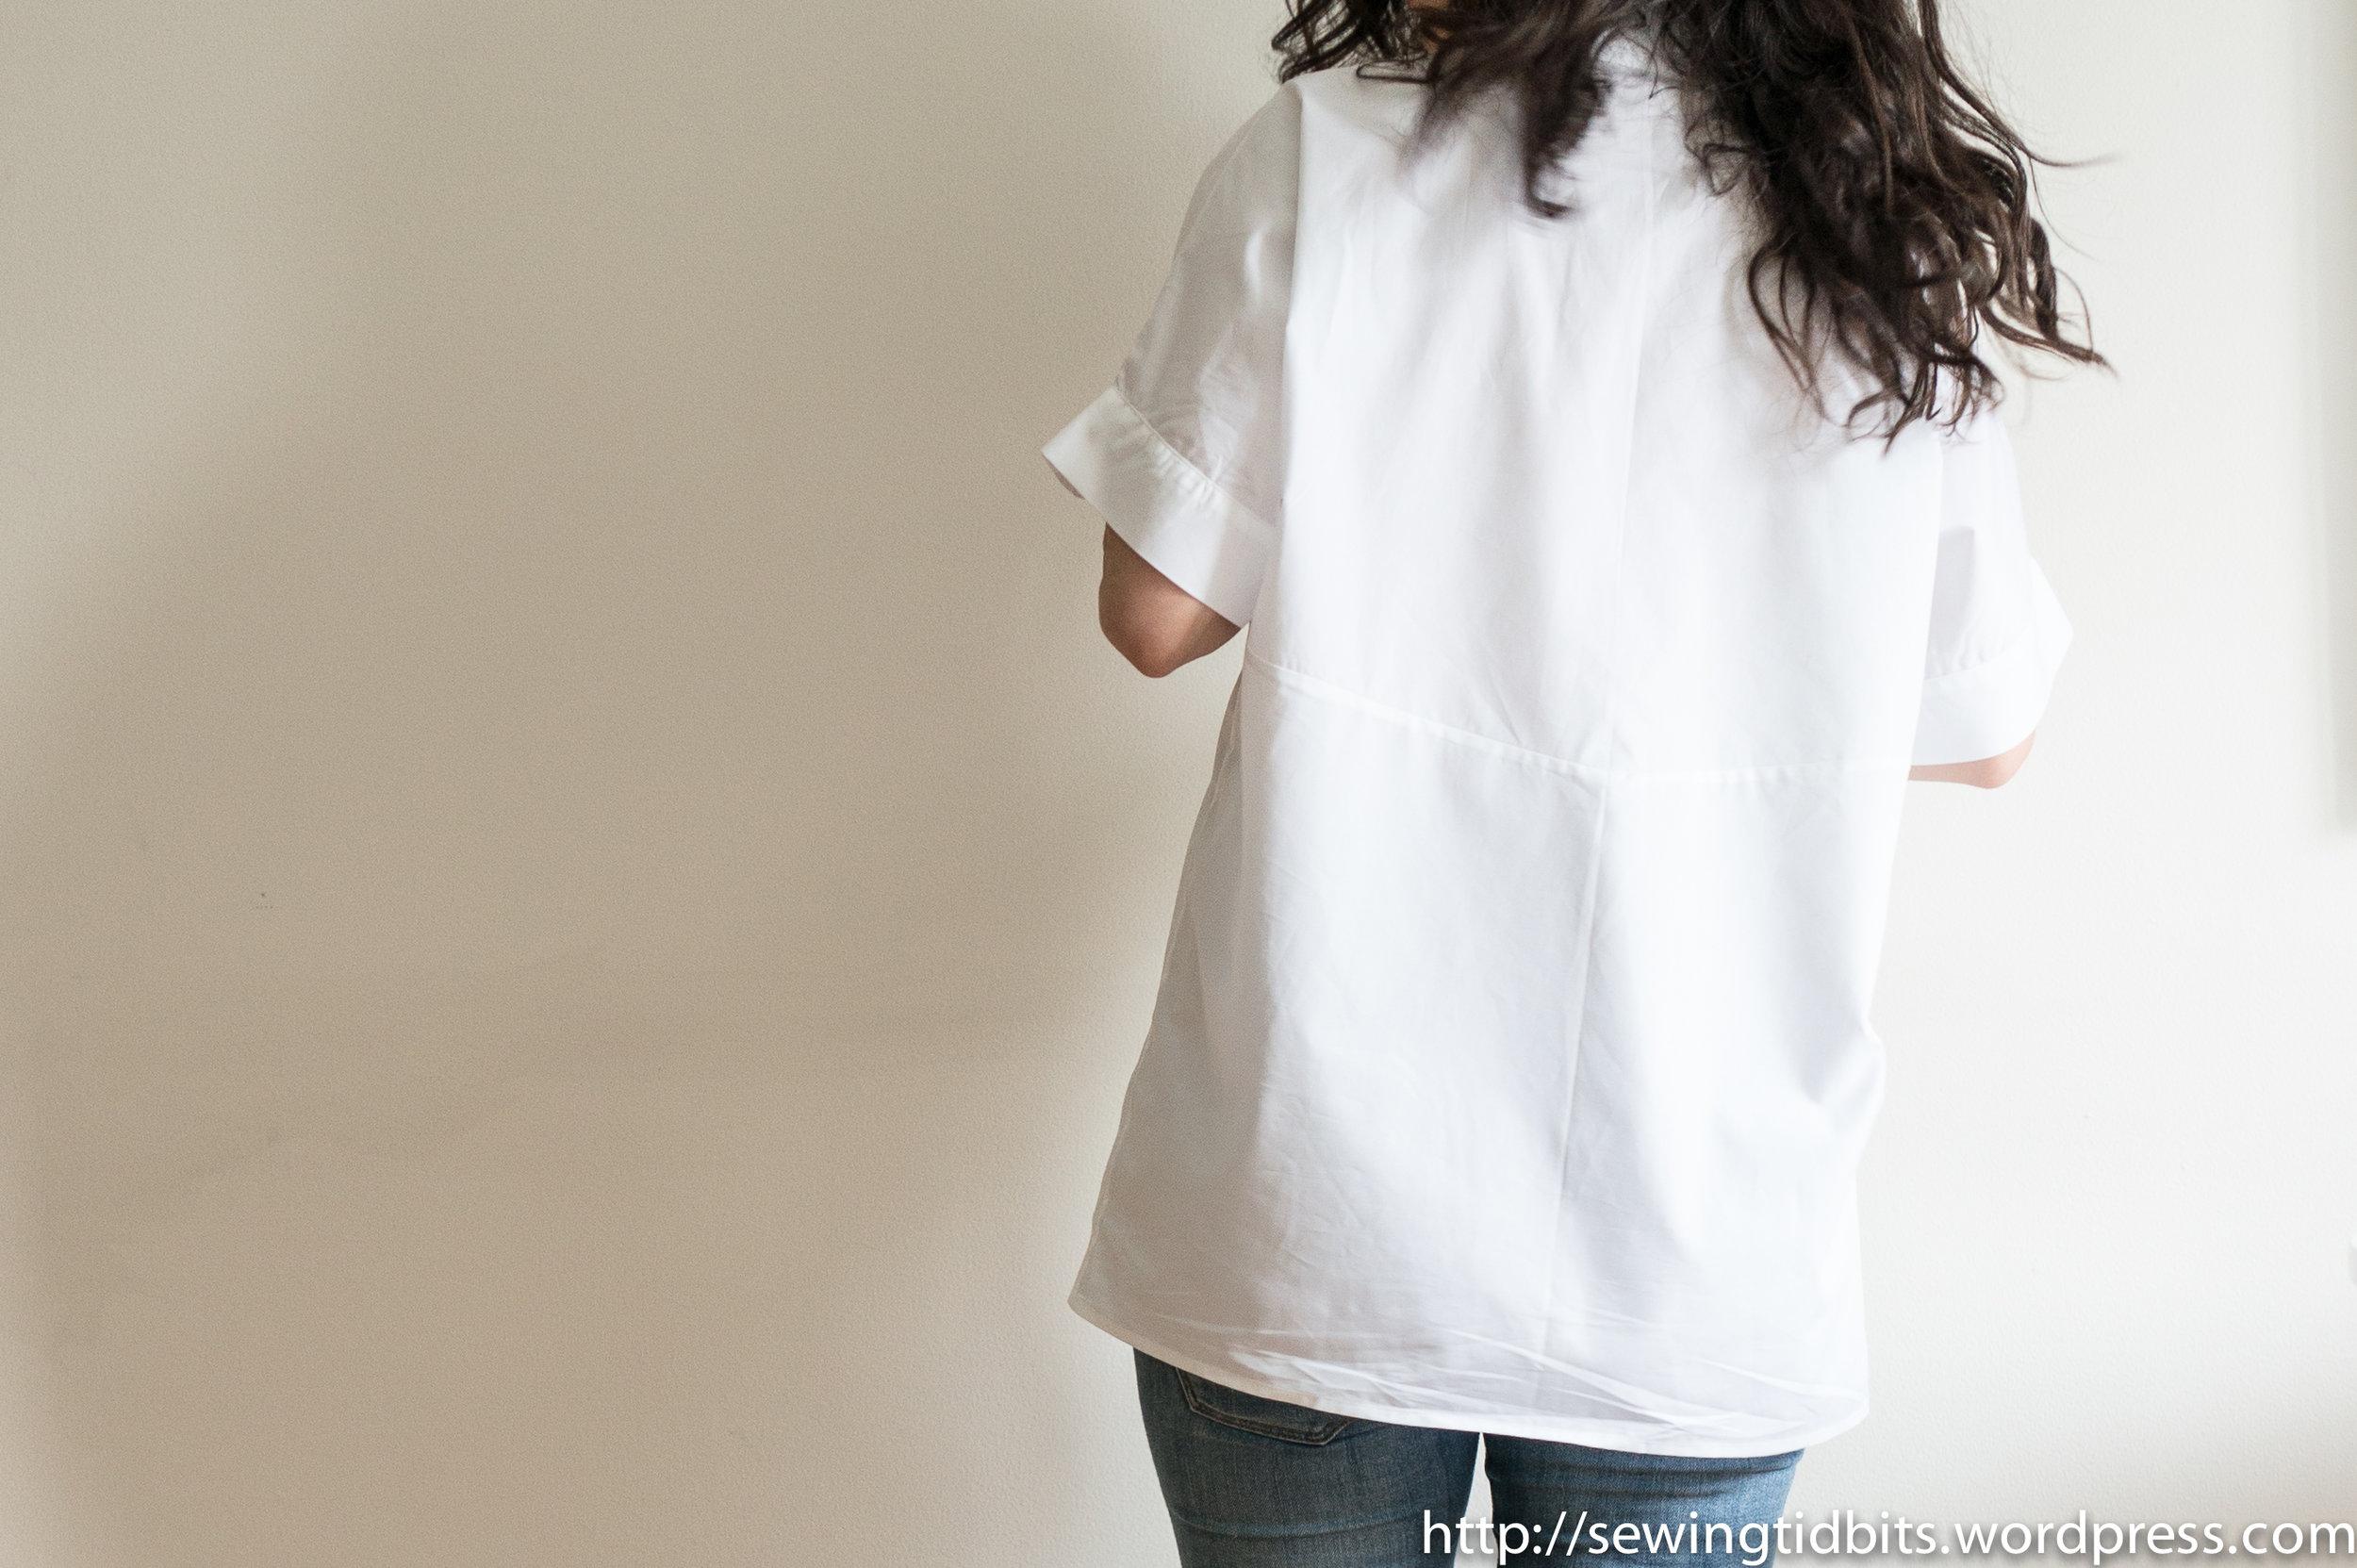 squareshirt-sewingtidbits-8.jpg